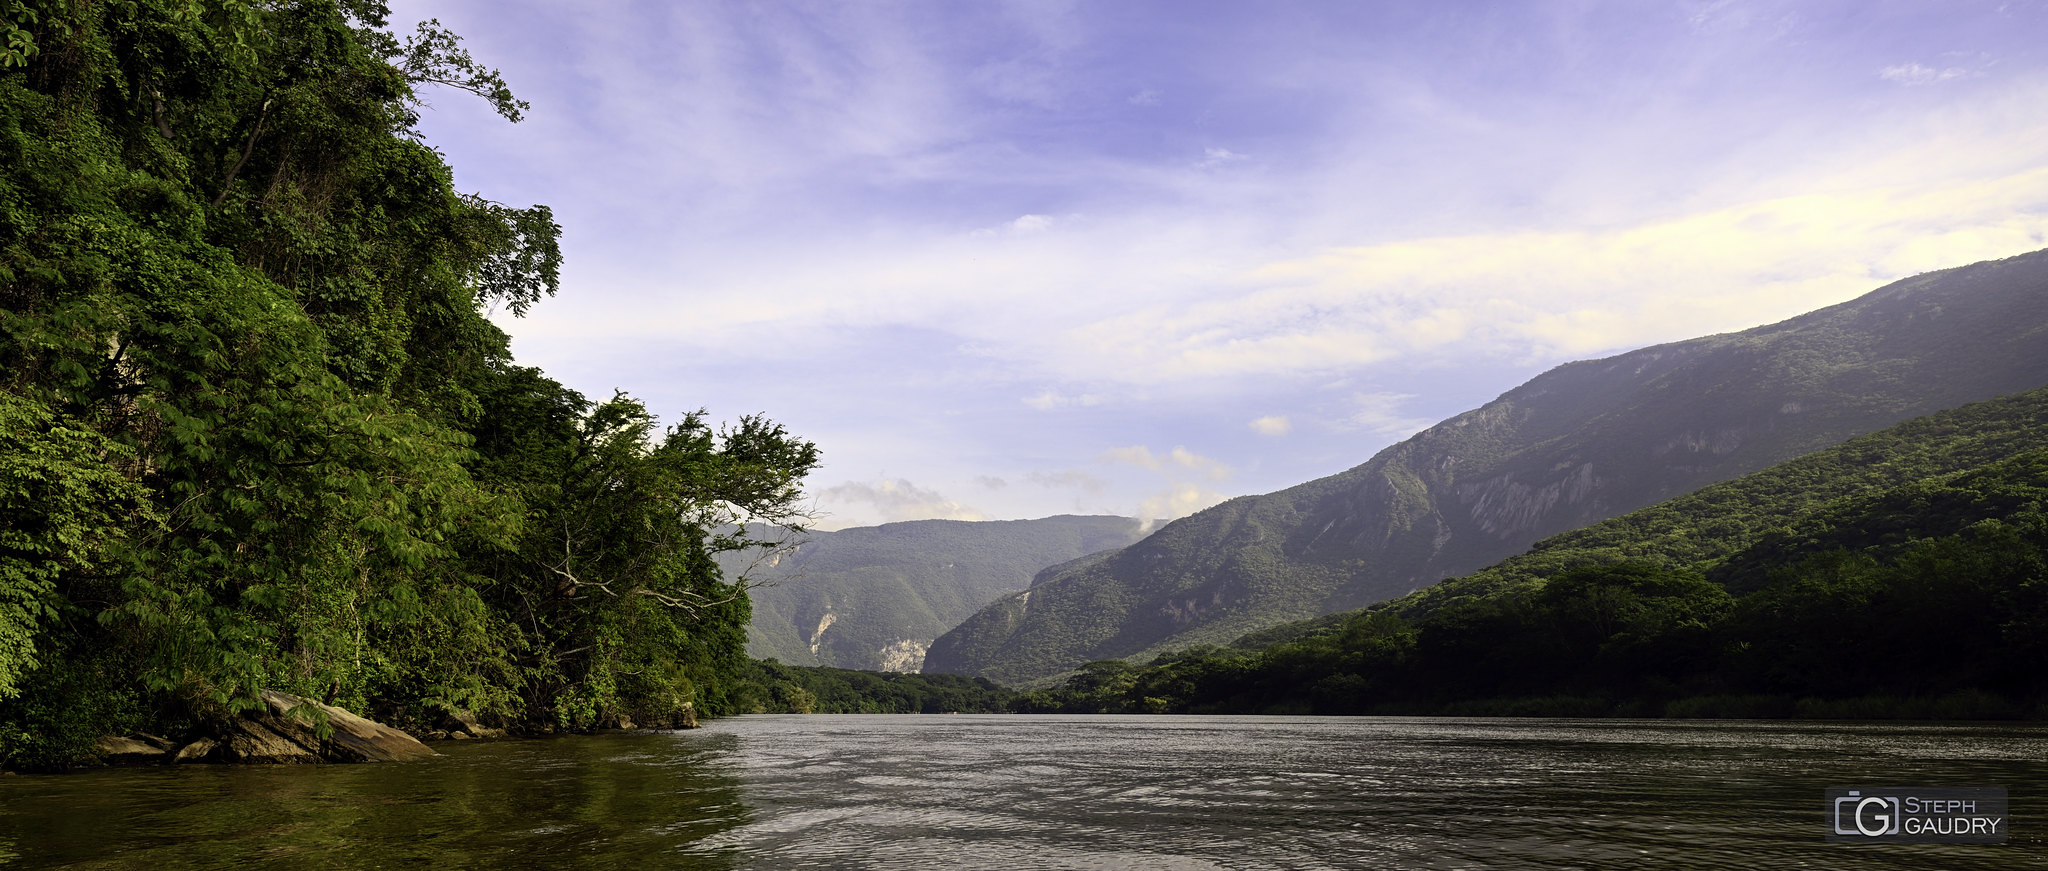 Les rives du Rio Grijalva (MEX) [Klik om de diavoorstelling te starten]